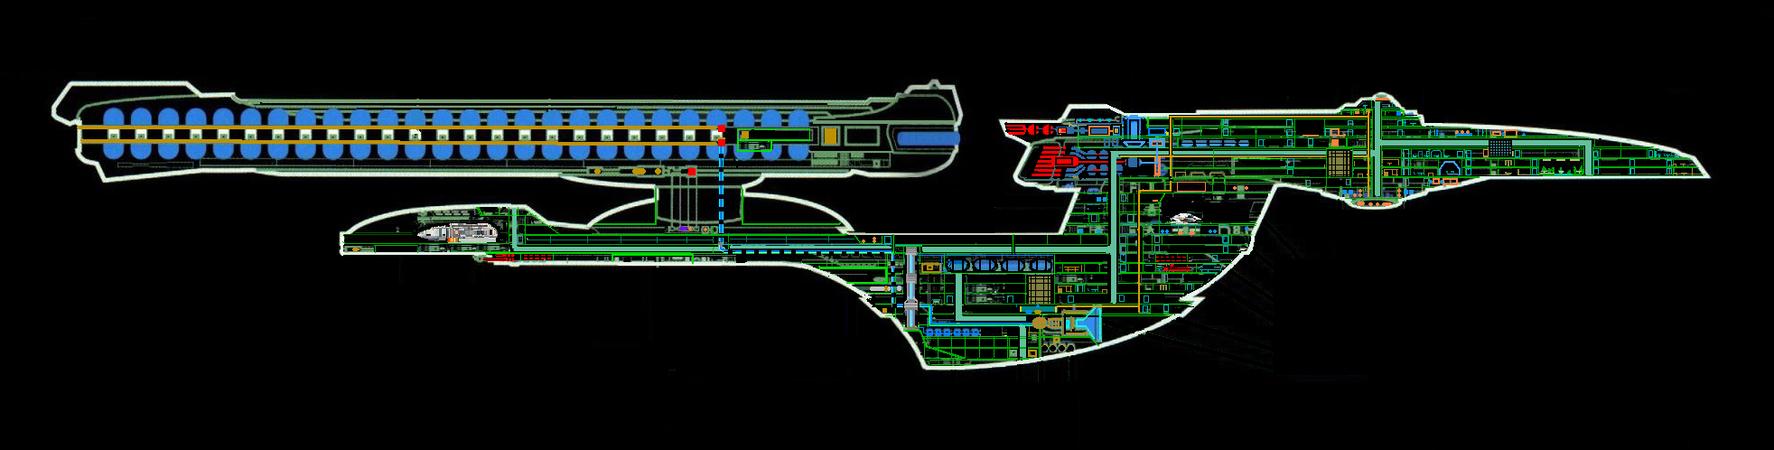 U.S.S. McAlester MSD by Merc-Raven